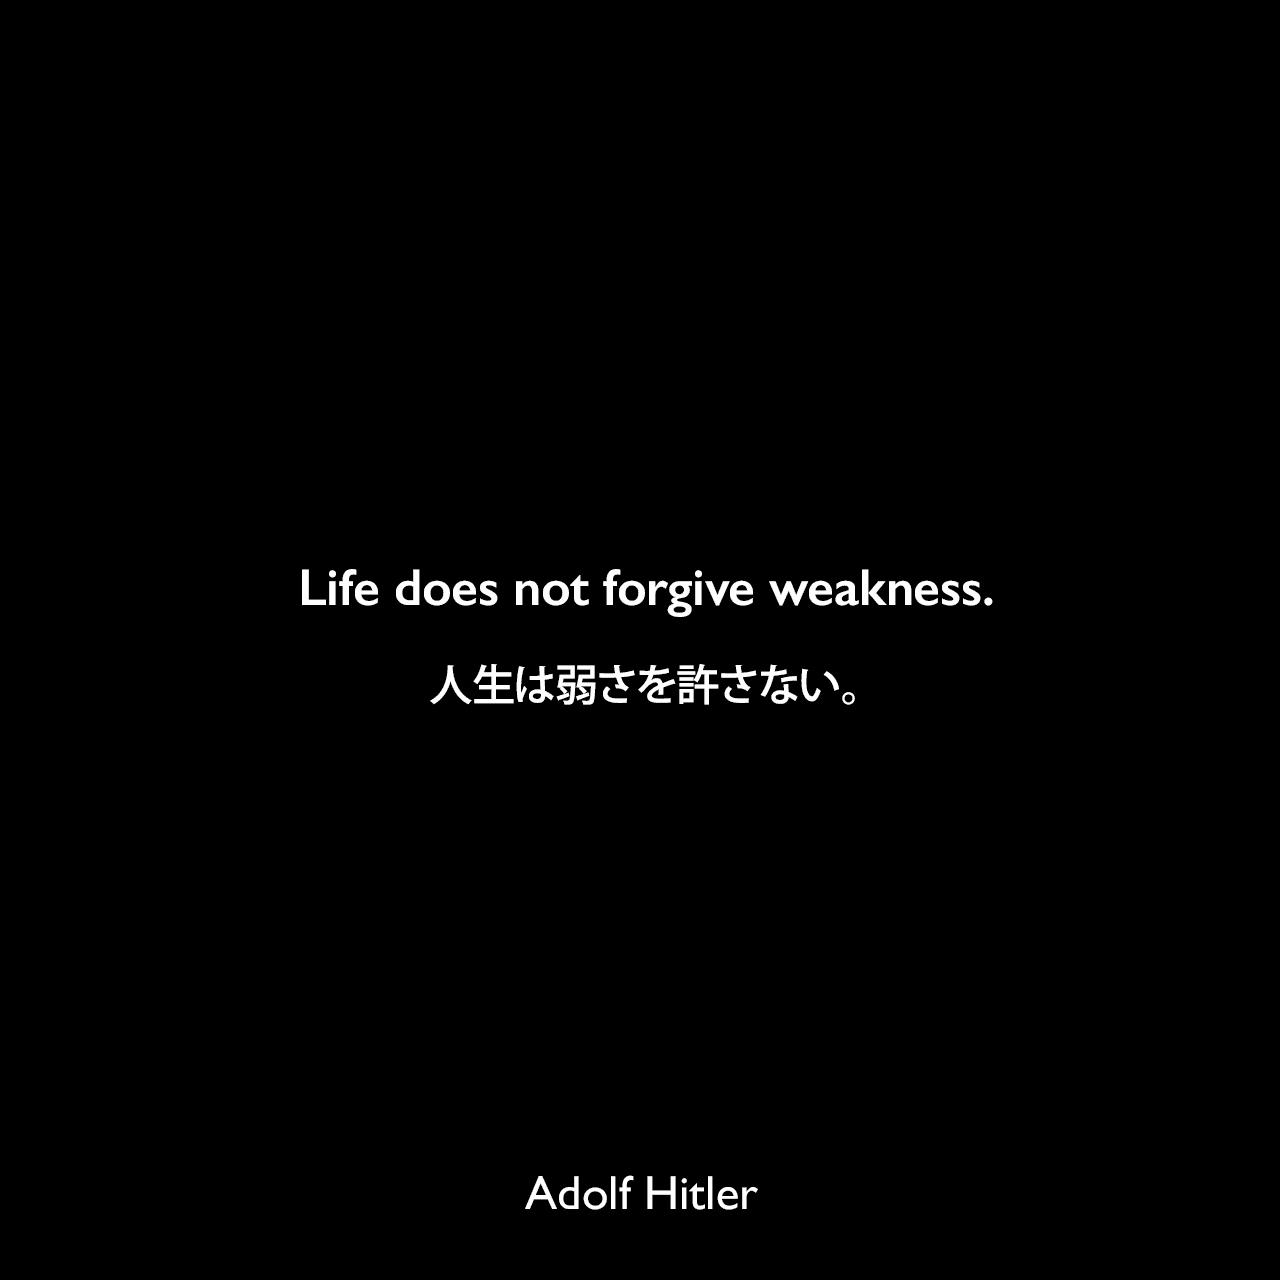 Life does not forgive weakness.人生は弱さを許さない。Adolf Hitler